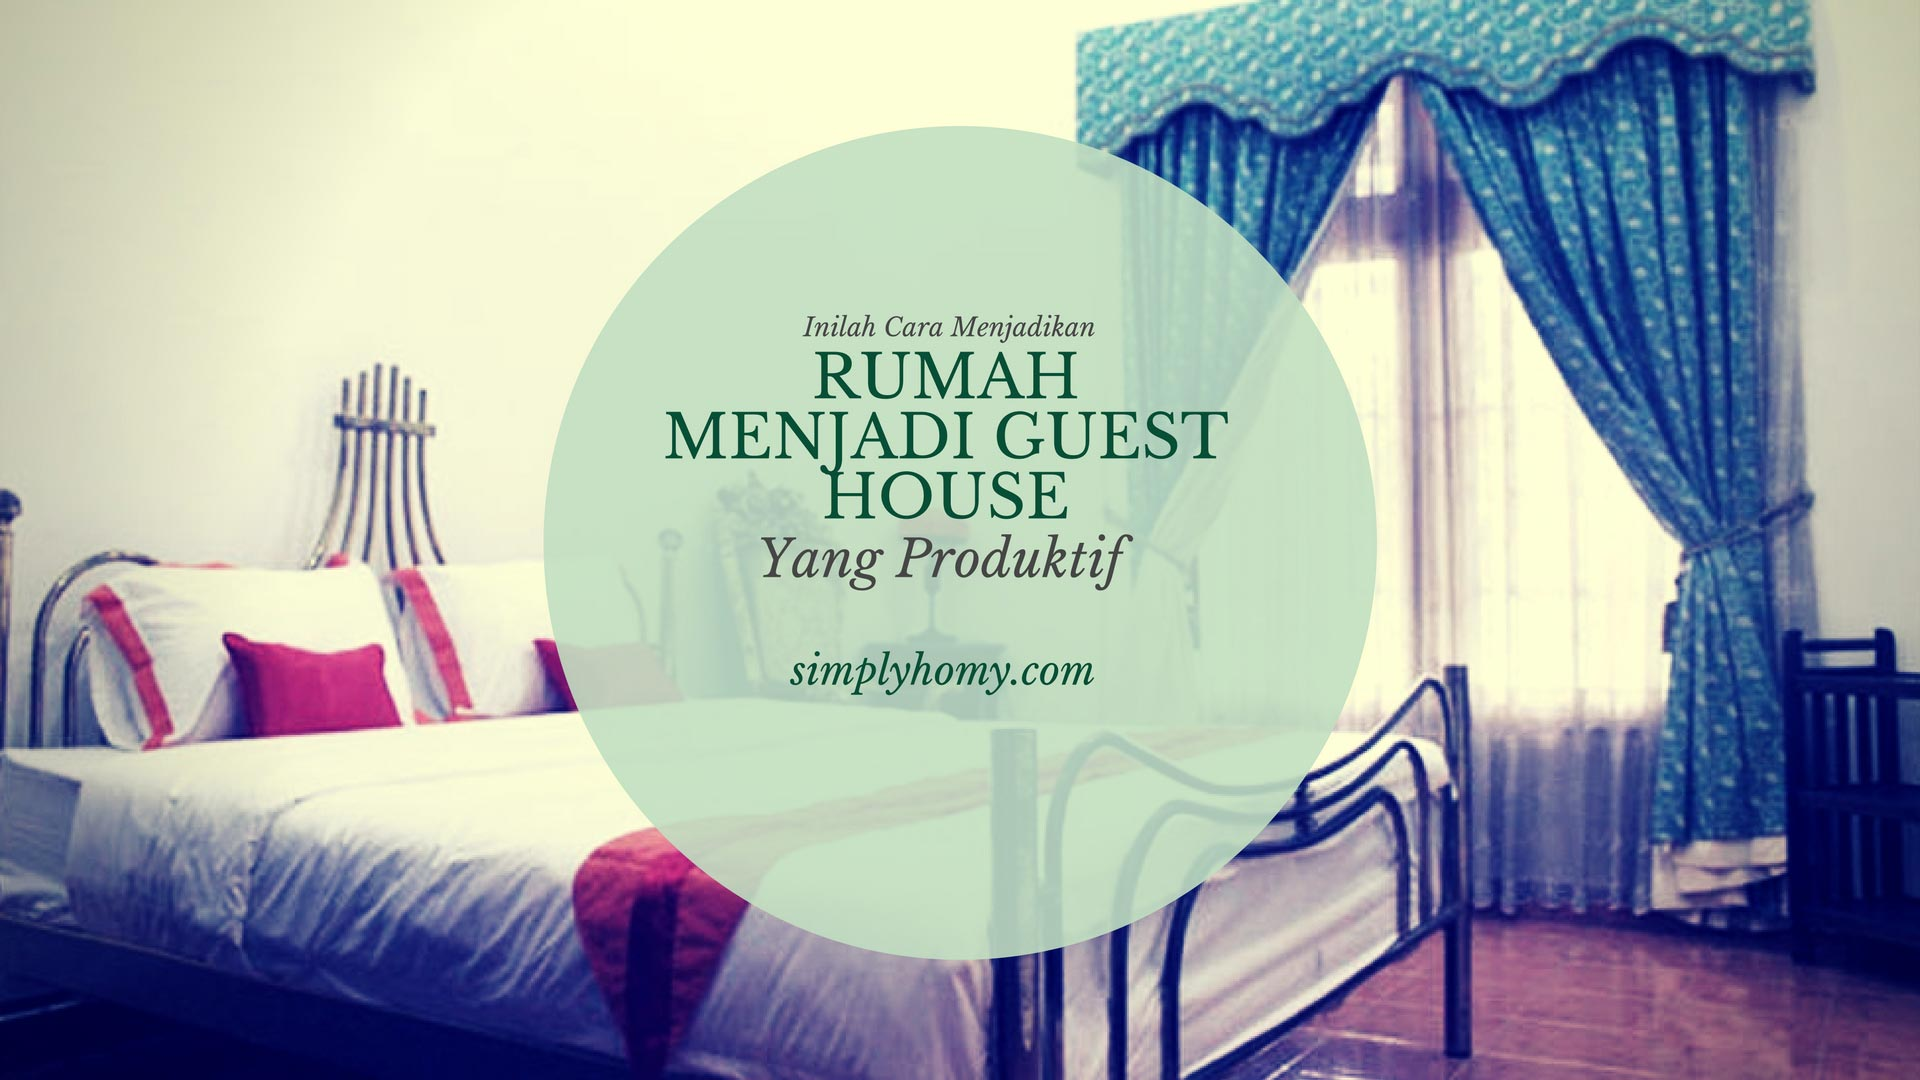 Inilah Cara Menjadikan Rumah Menjadi Guest House Yang Produktif